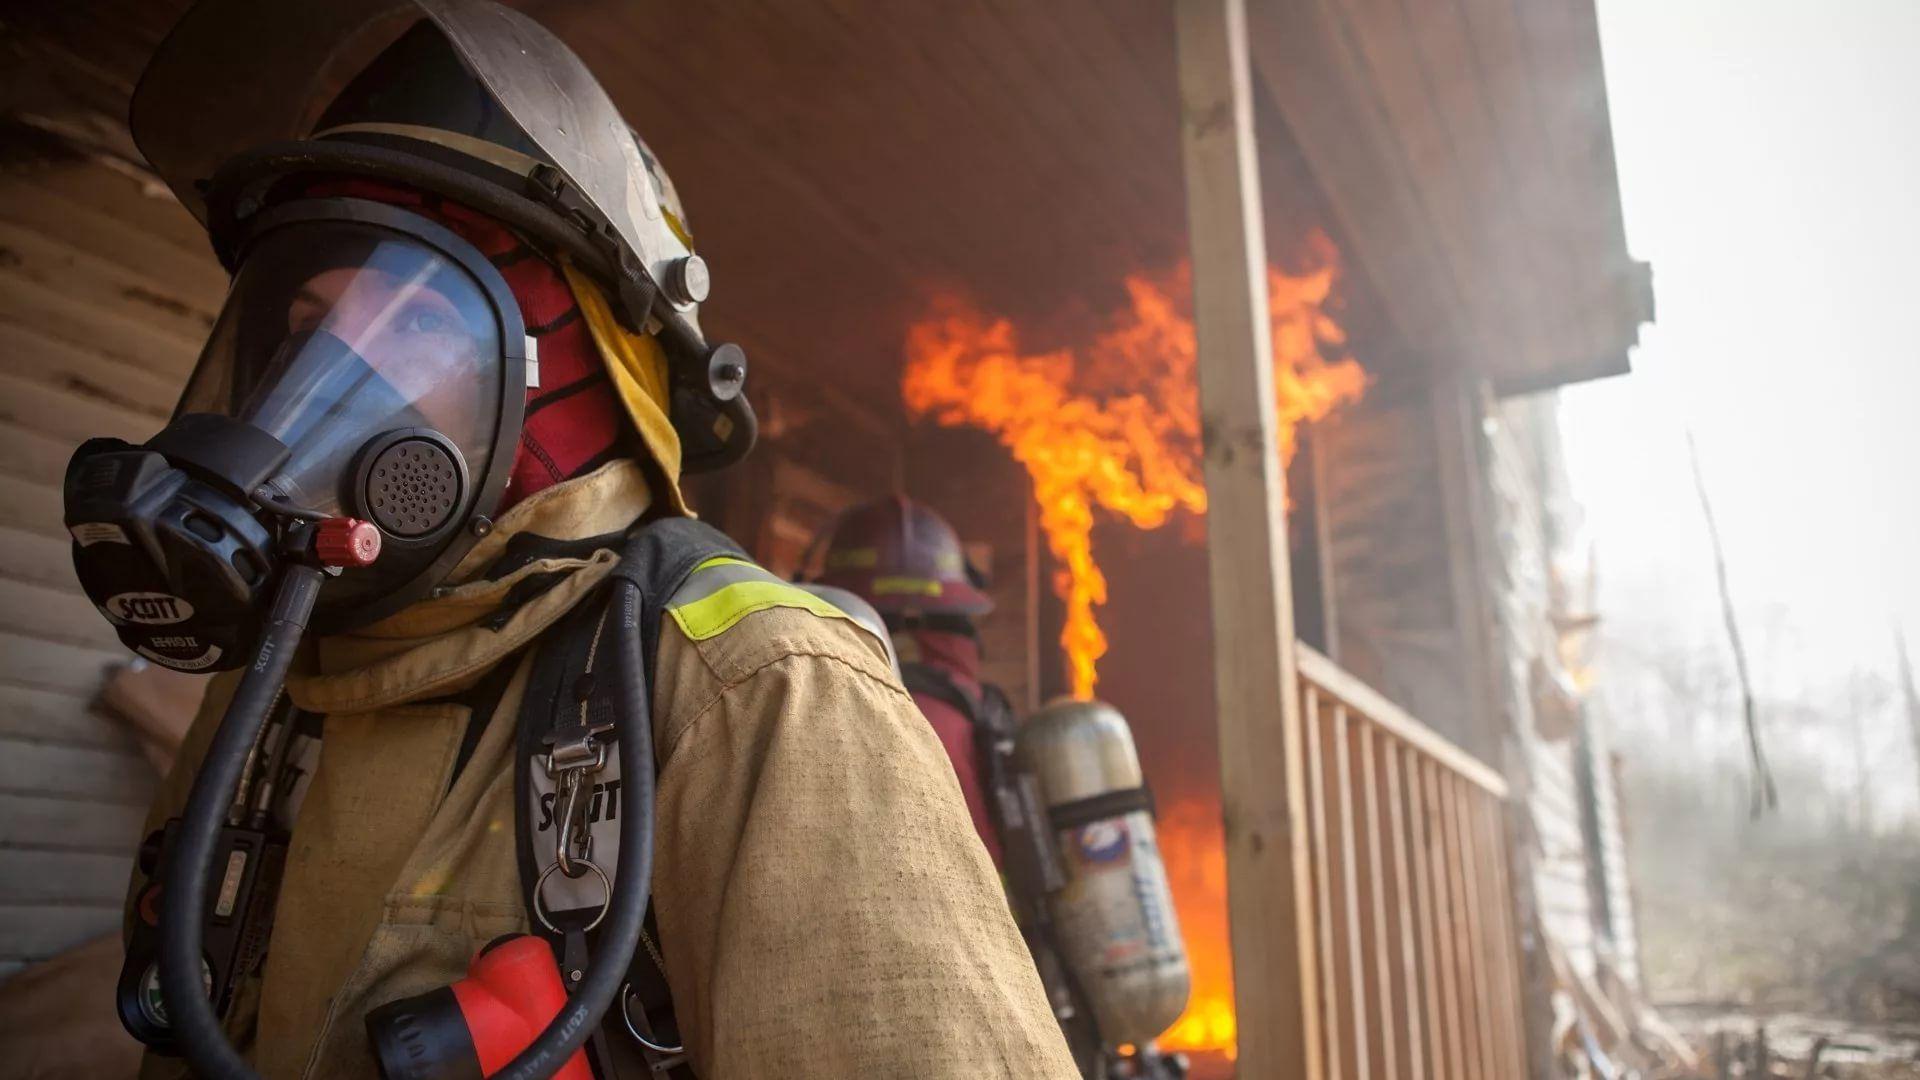 Firefighter Background Wallpaper HD